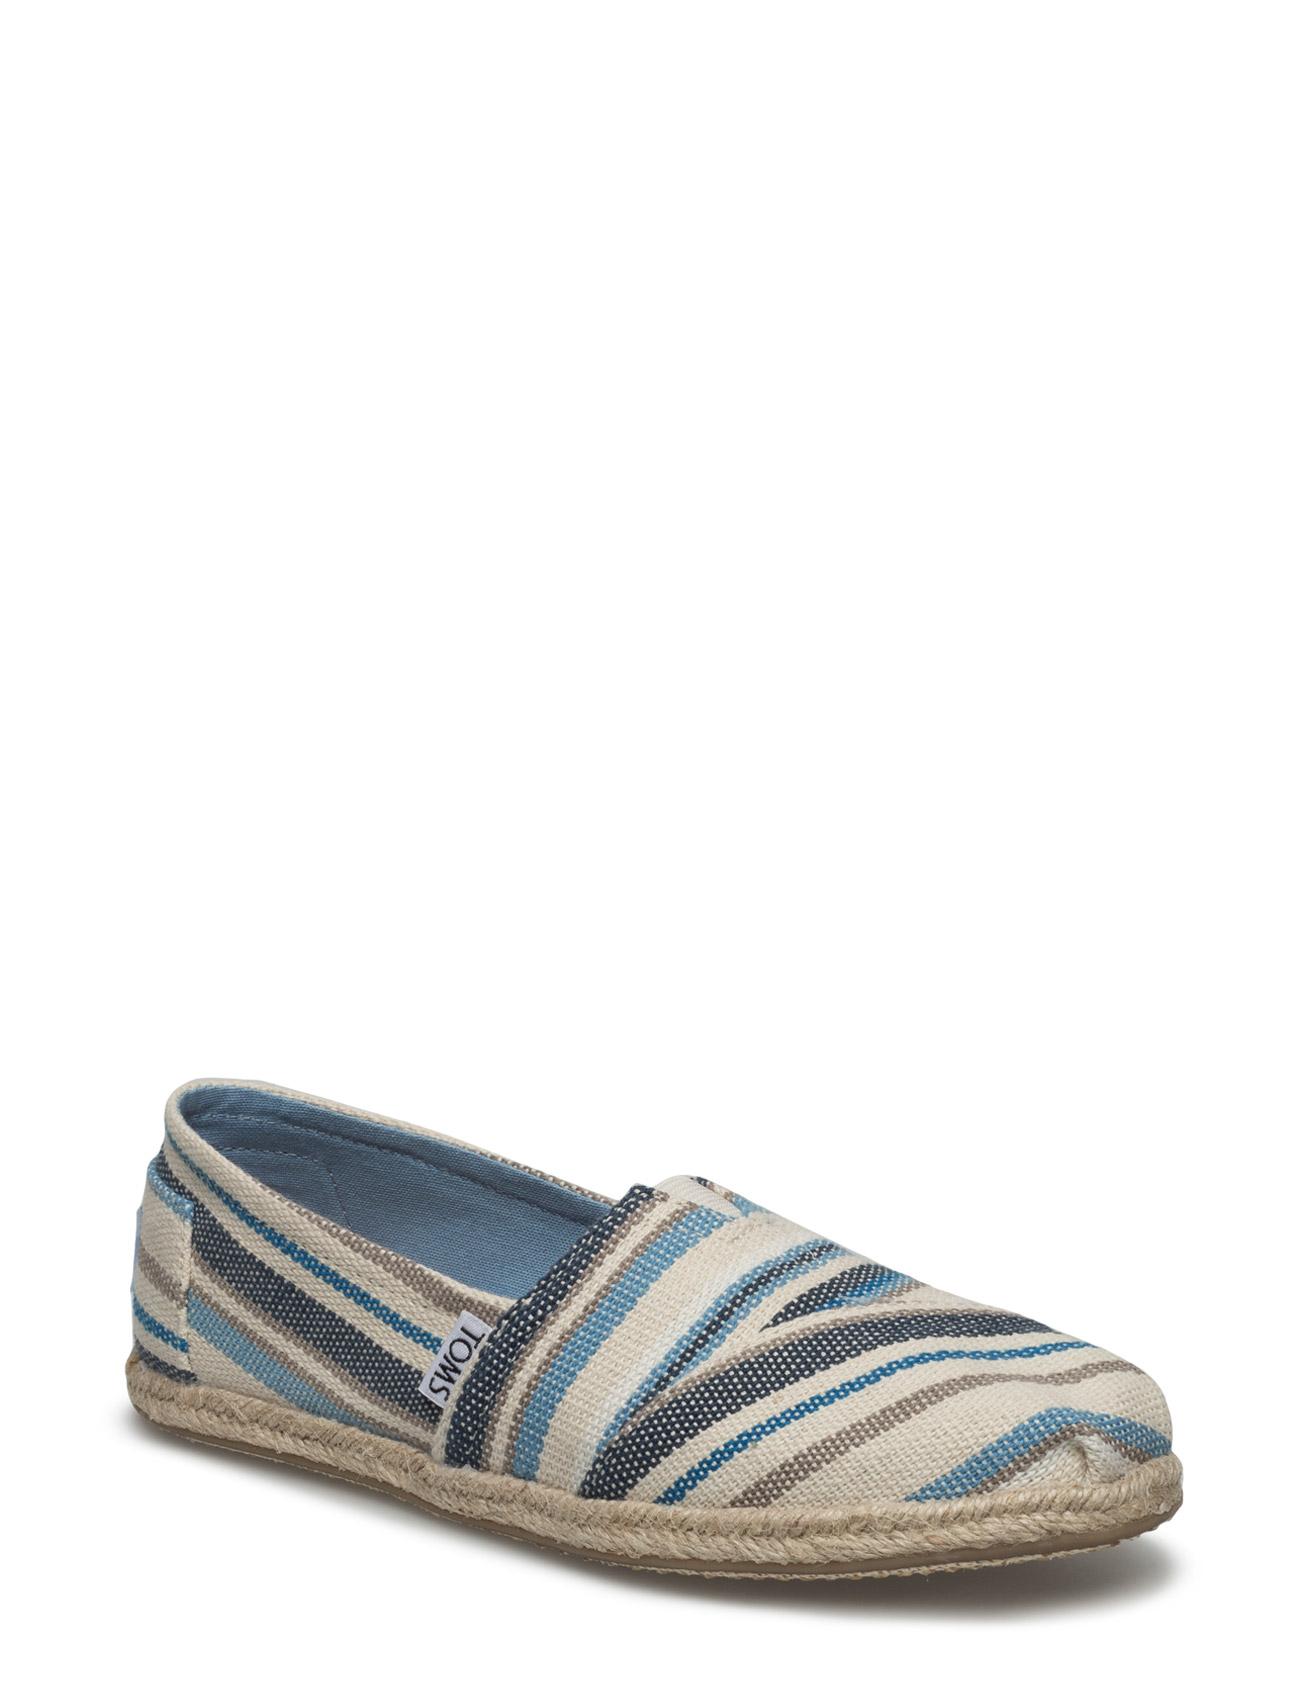 Blue Aster Woven Stripe Rop Alpargata TOMS Espadrillos